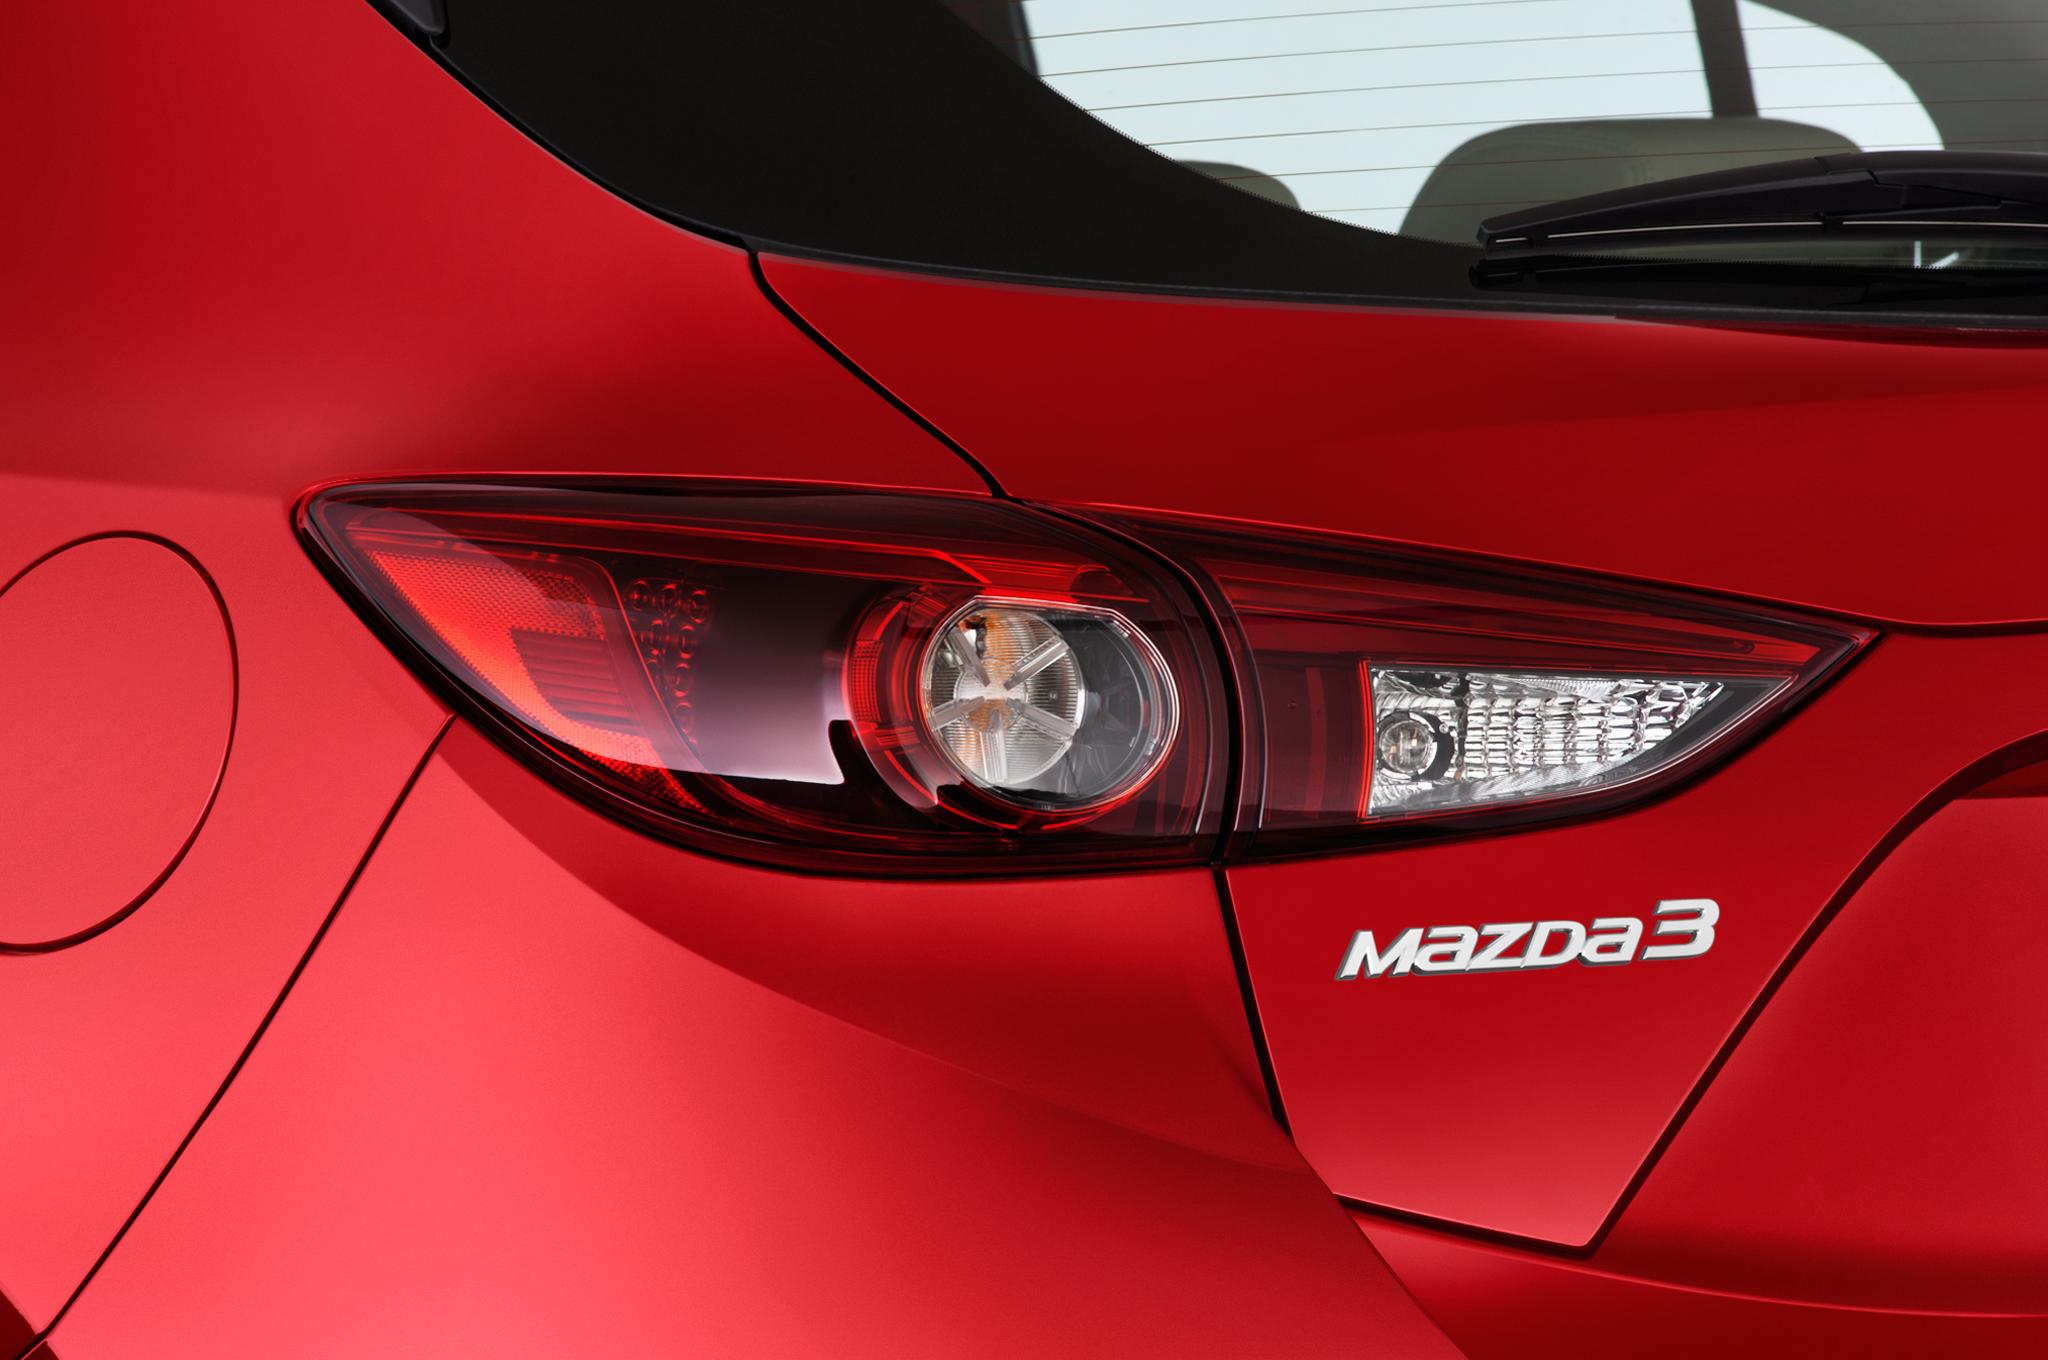 2015 Mazda 3 Updated, Gains Manual Transmission for 2 5L Engine